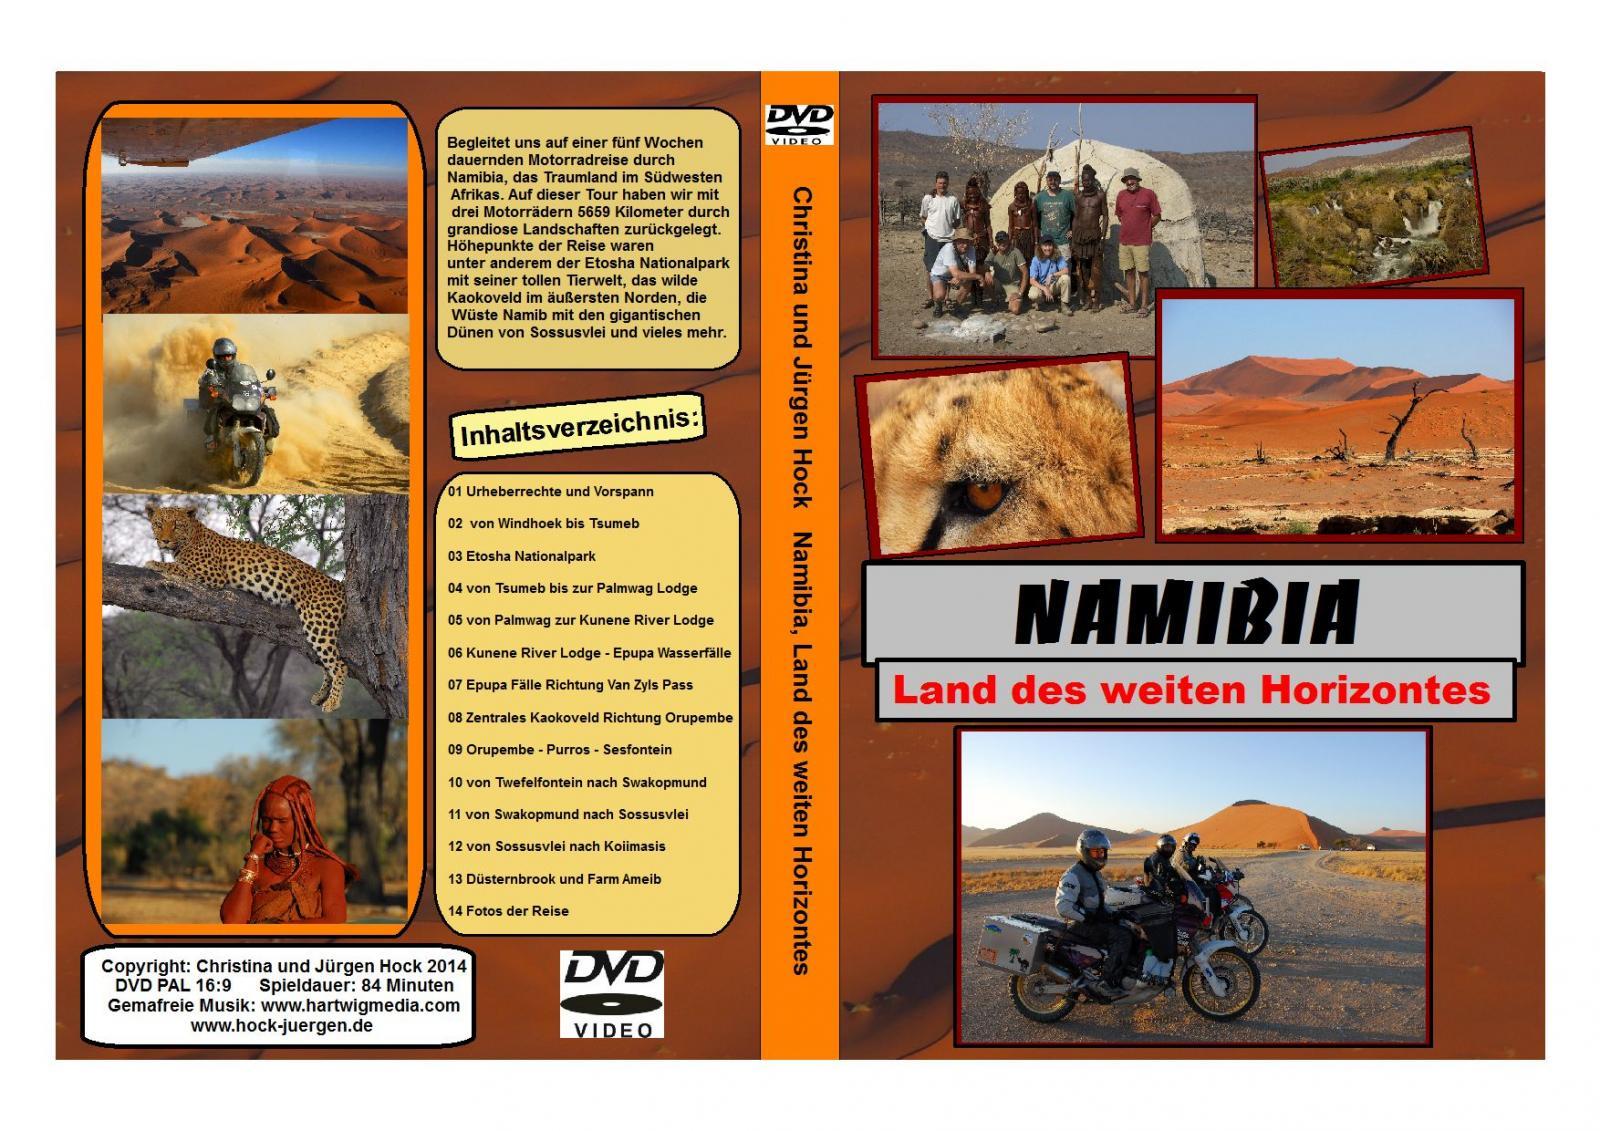 h-lle-namibia-4.jpg